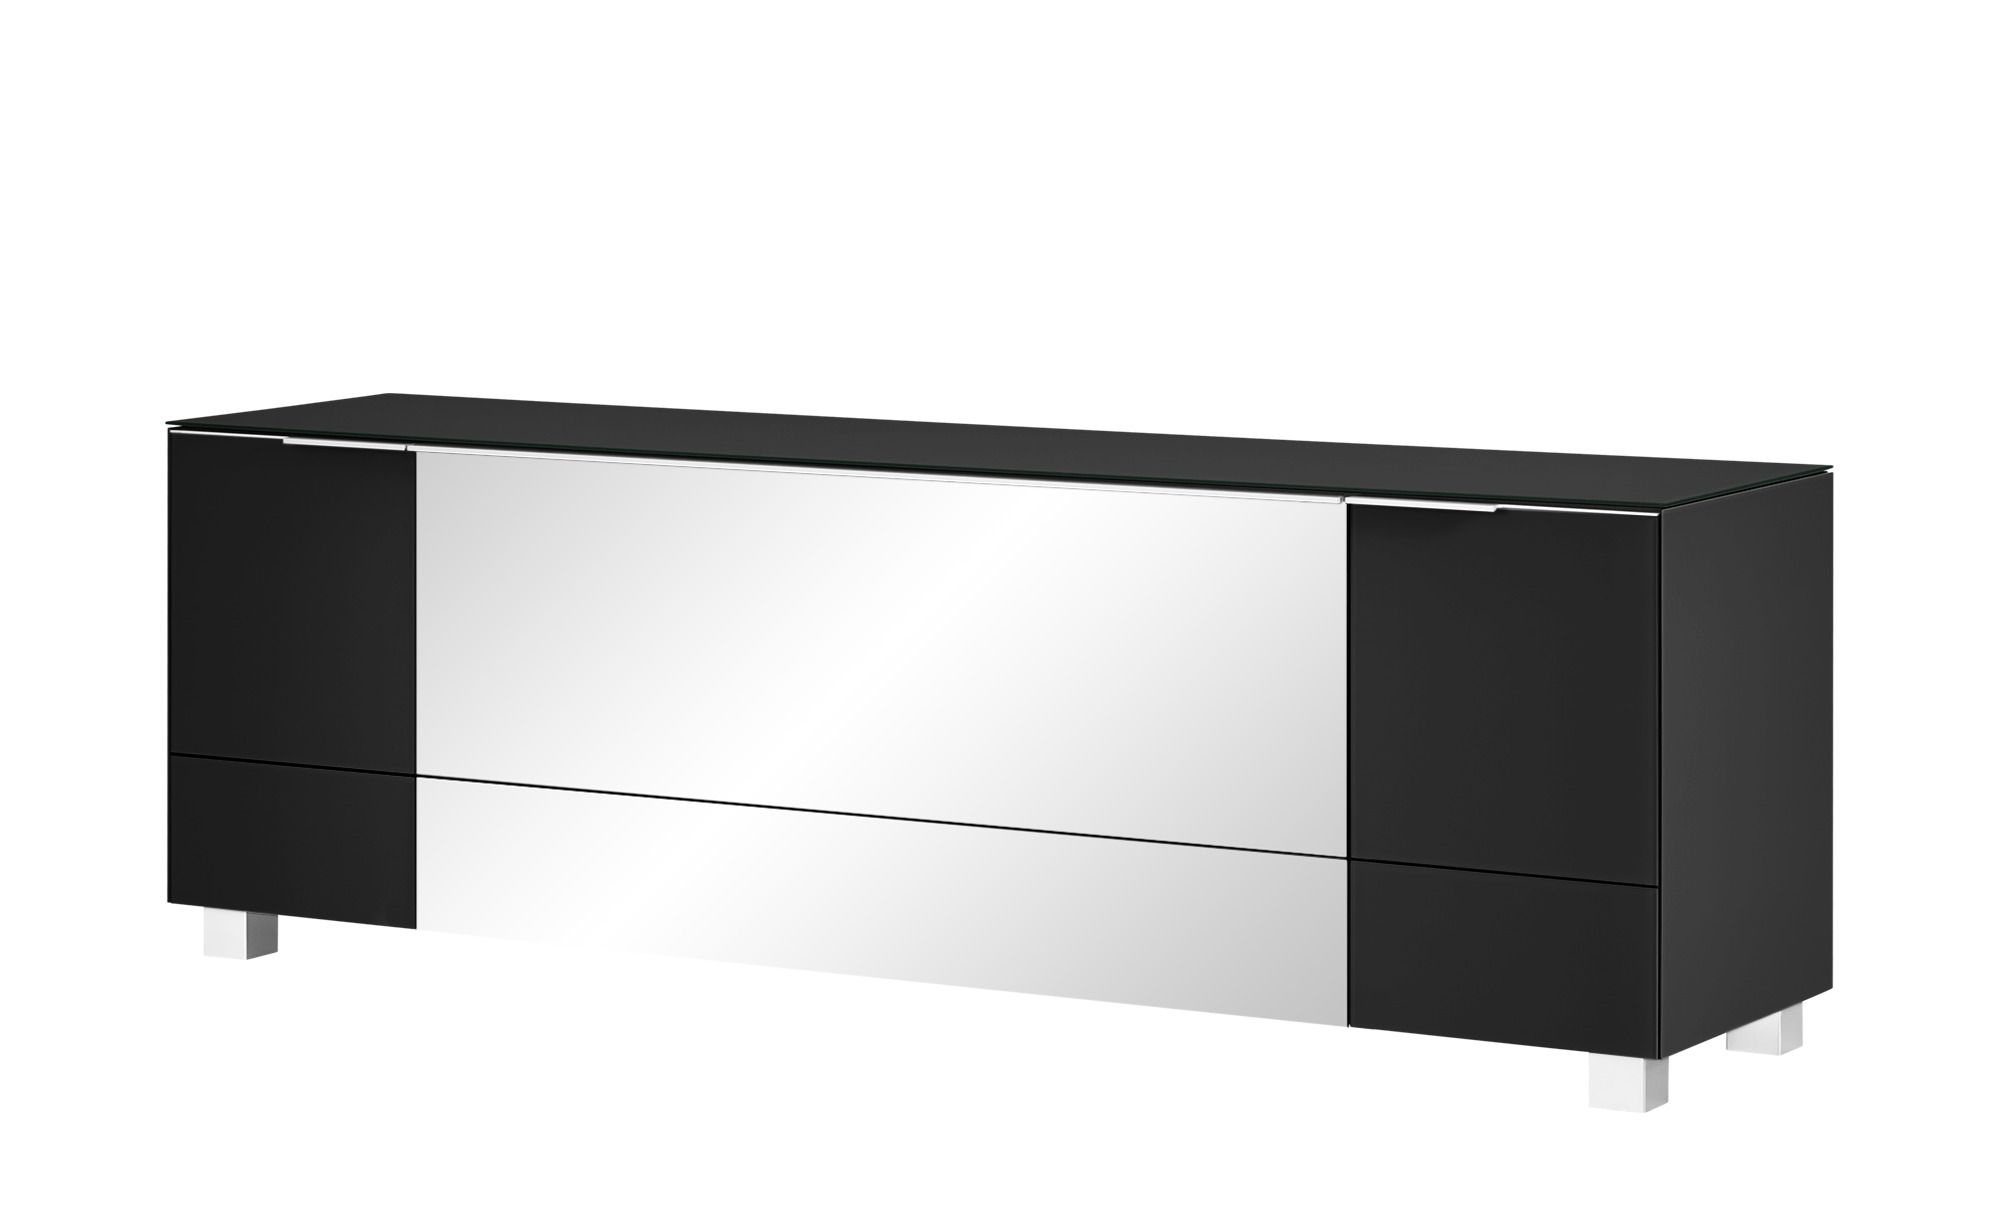 Pin By Ladendirekt On Tv Hifi Mobel Decor Furniture Storage